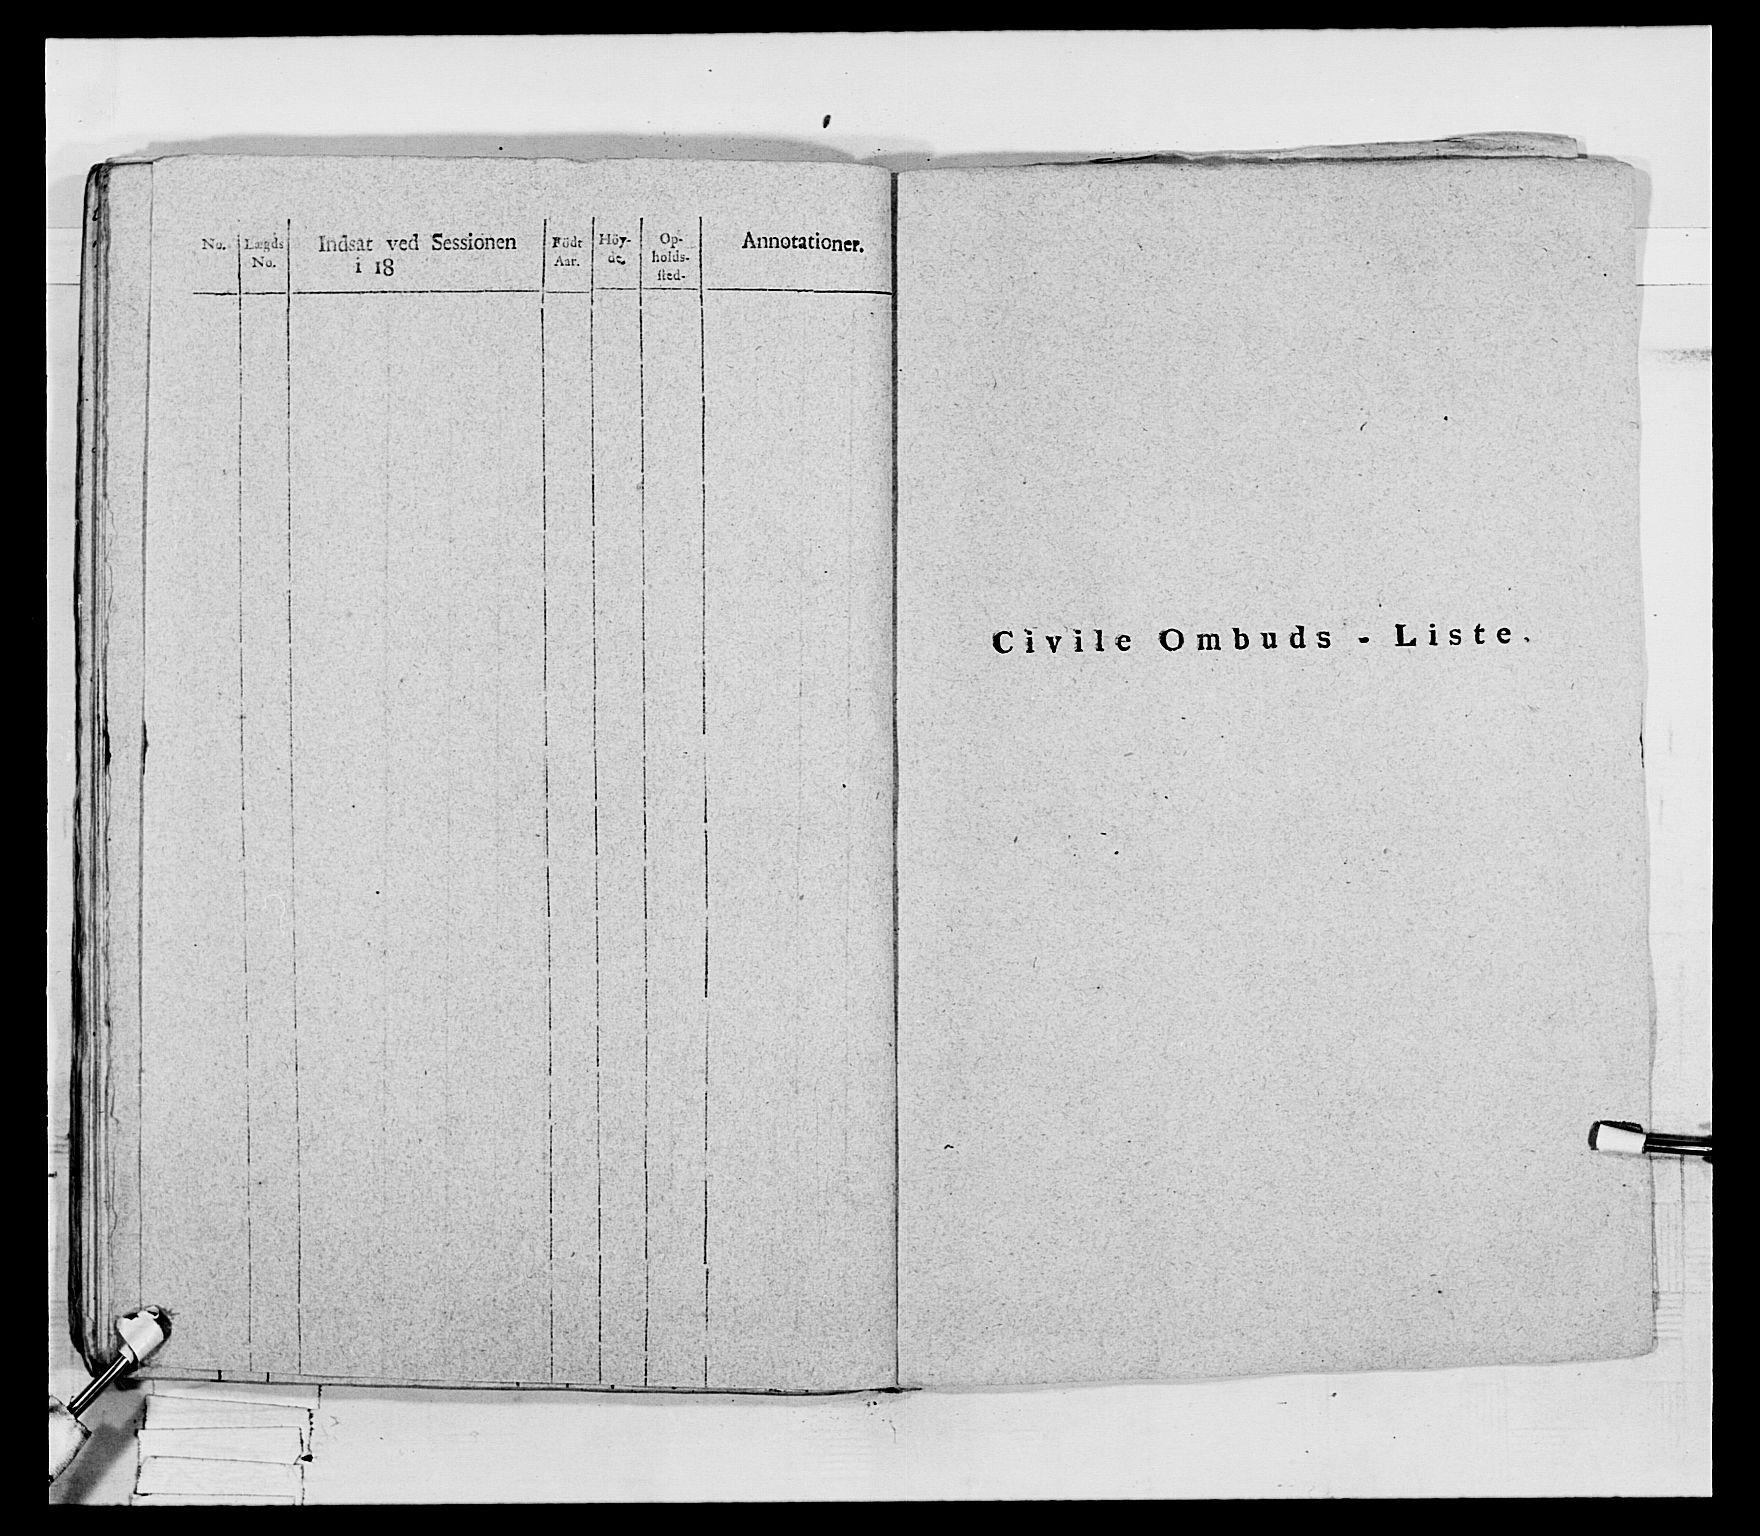 RA, Generalitets- og kommissariatskollegiet, Det kongelige norske kommissariatskollegium, E/Eh/L0069: Opplandske gevorbne infanteriregiment, 1810-1818, s. 207